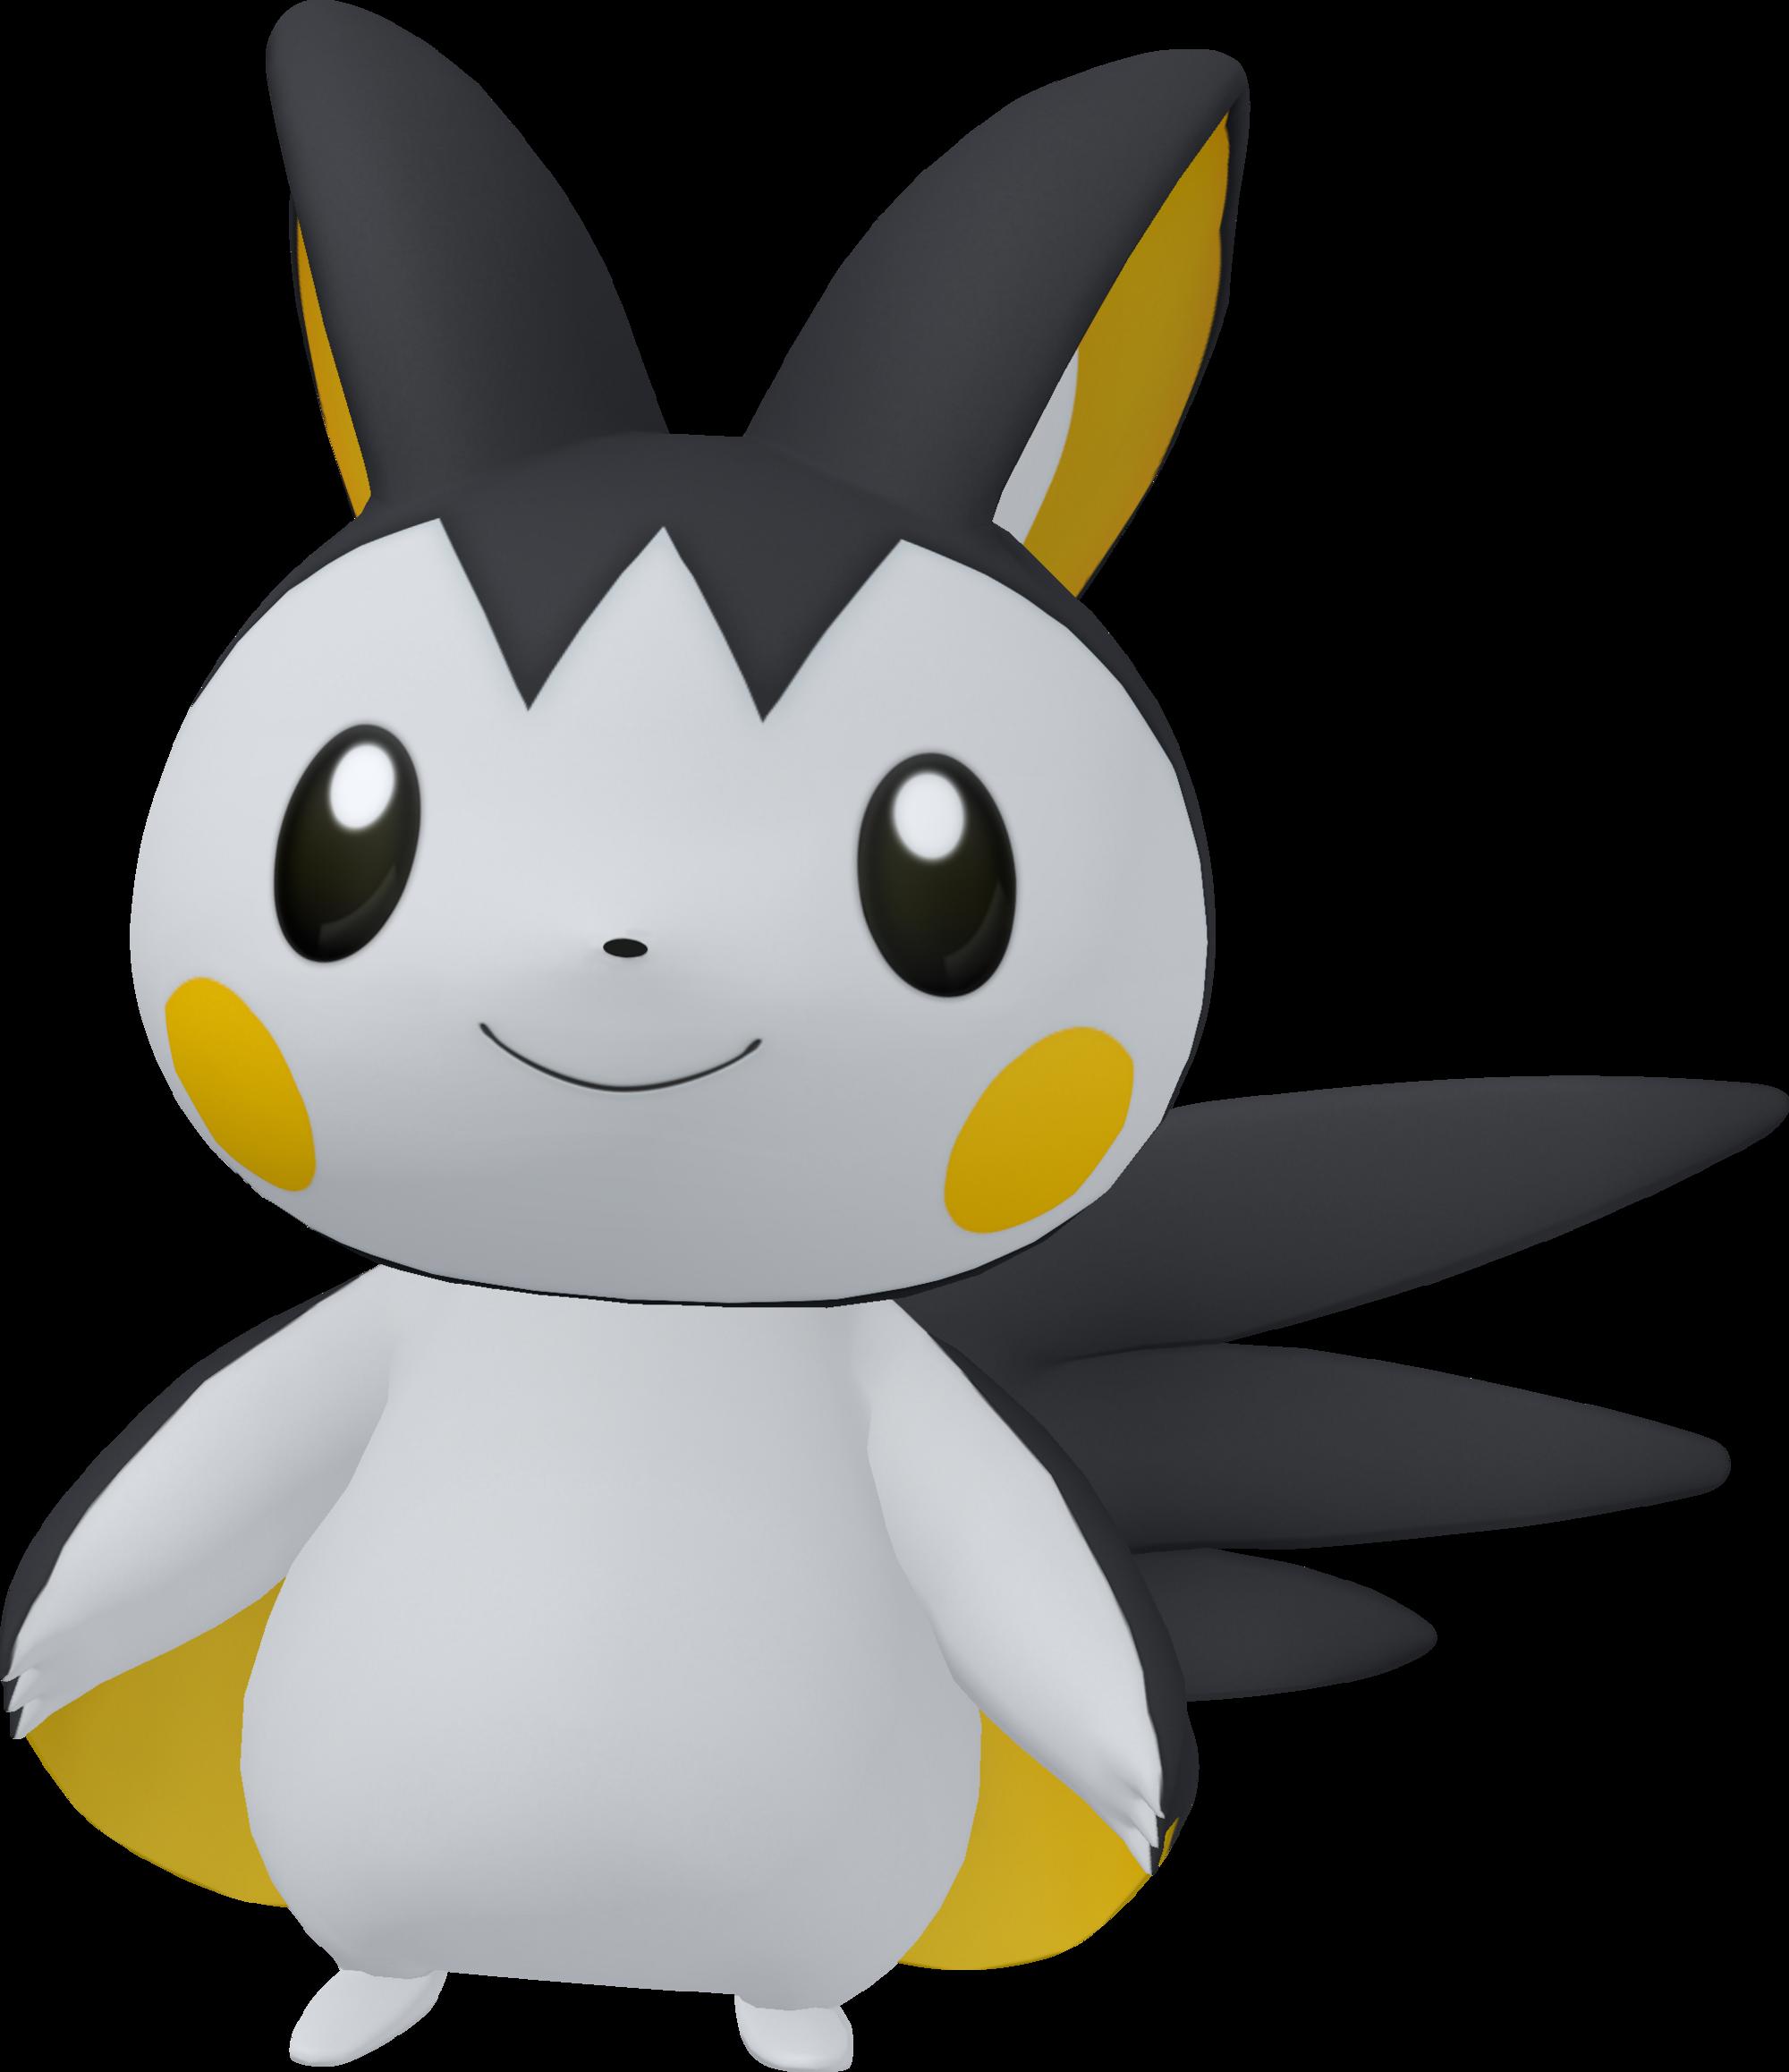 Emolga pok mon wiki fandom powered by wikia - Pokemon perle evolution ...